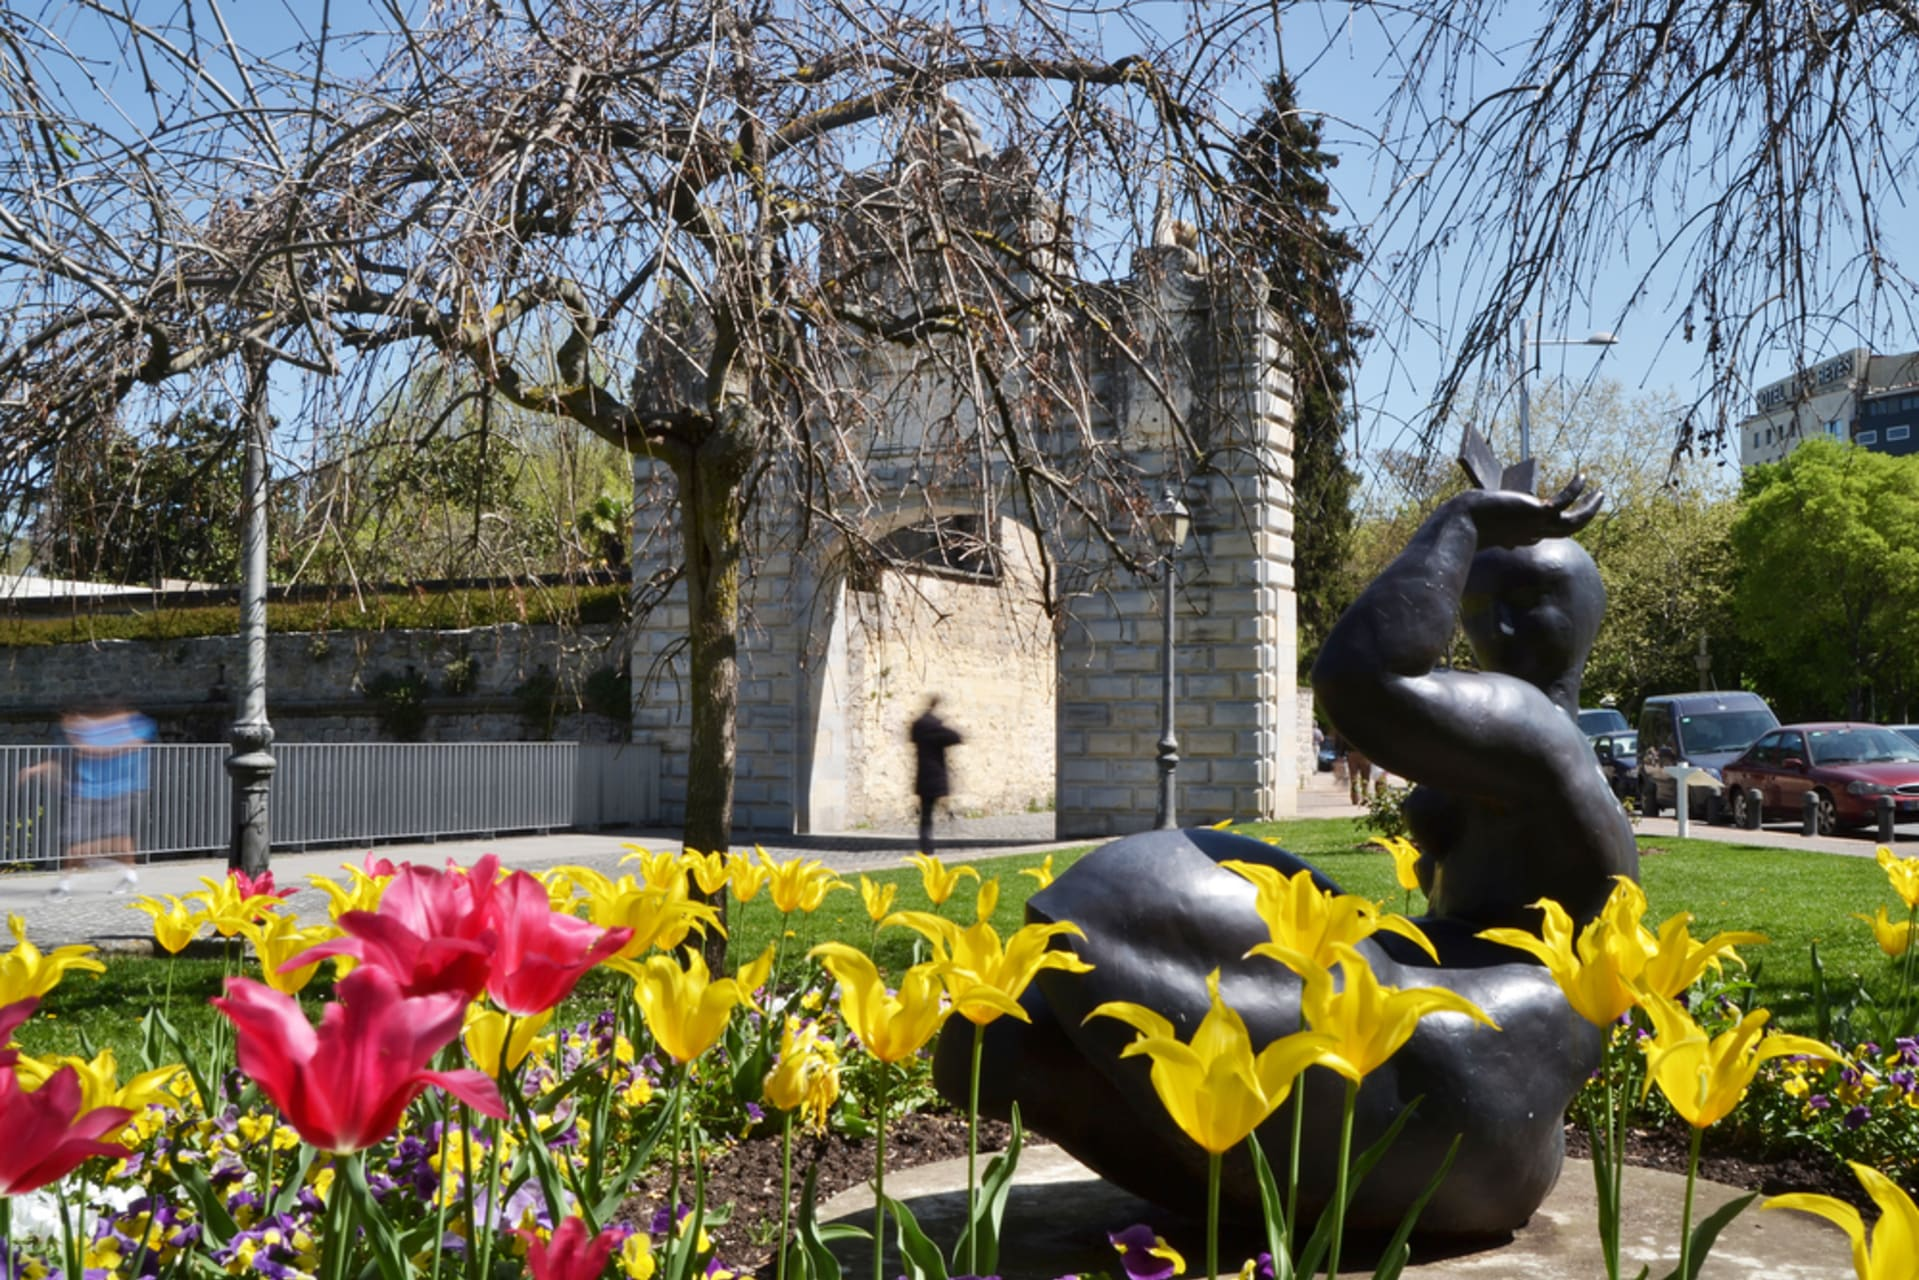 Pamplona - Spring has Sprung in Pamplona